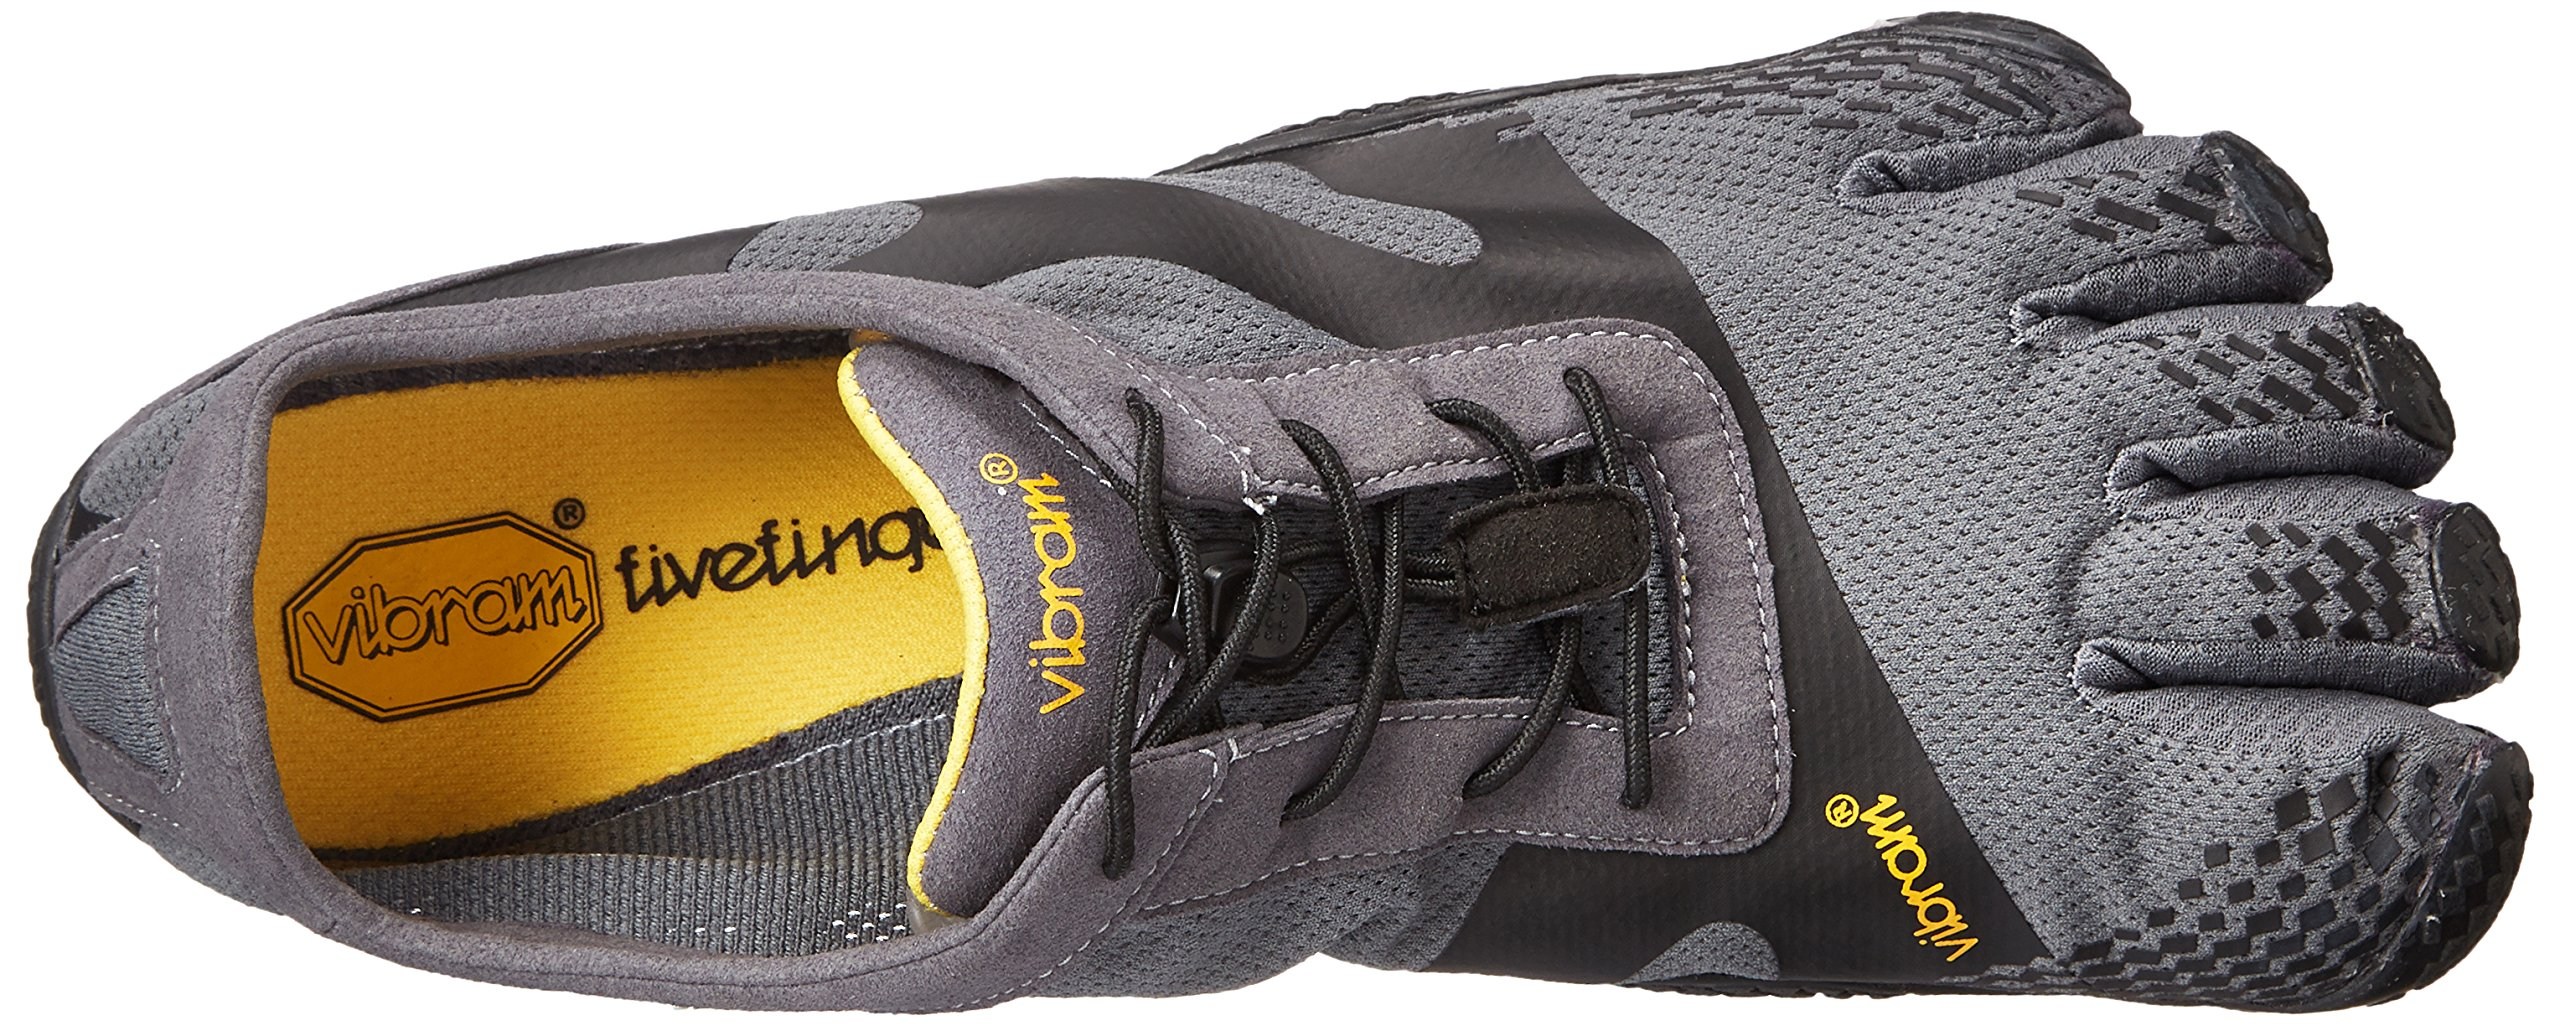 Vibram Men's KSO EVO Cross Training Shoe,Grey/Black,41 EU/8.5-9.0 M US by Vibram (Image #10)